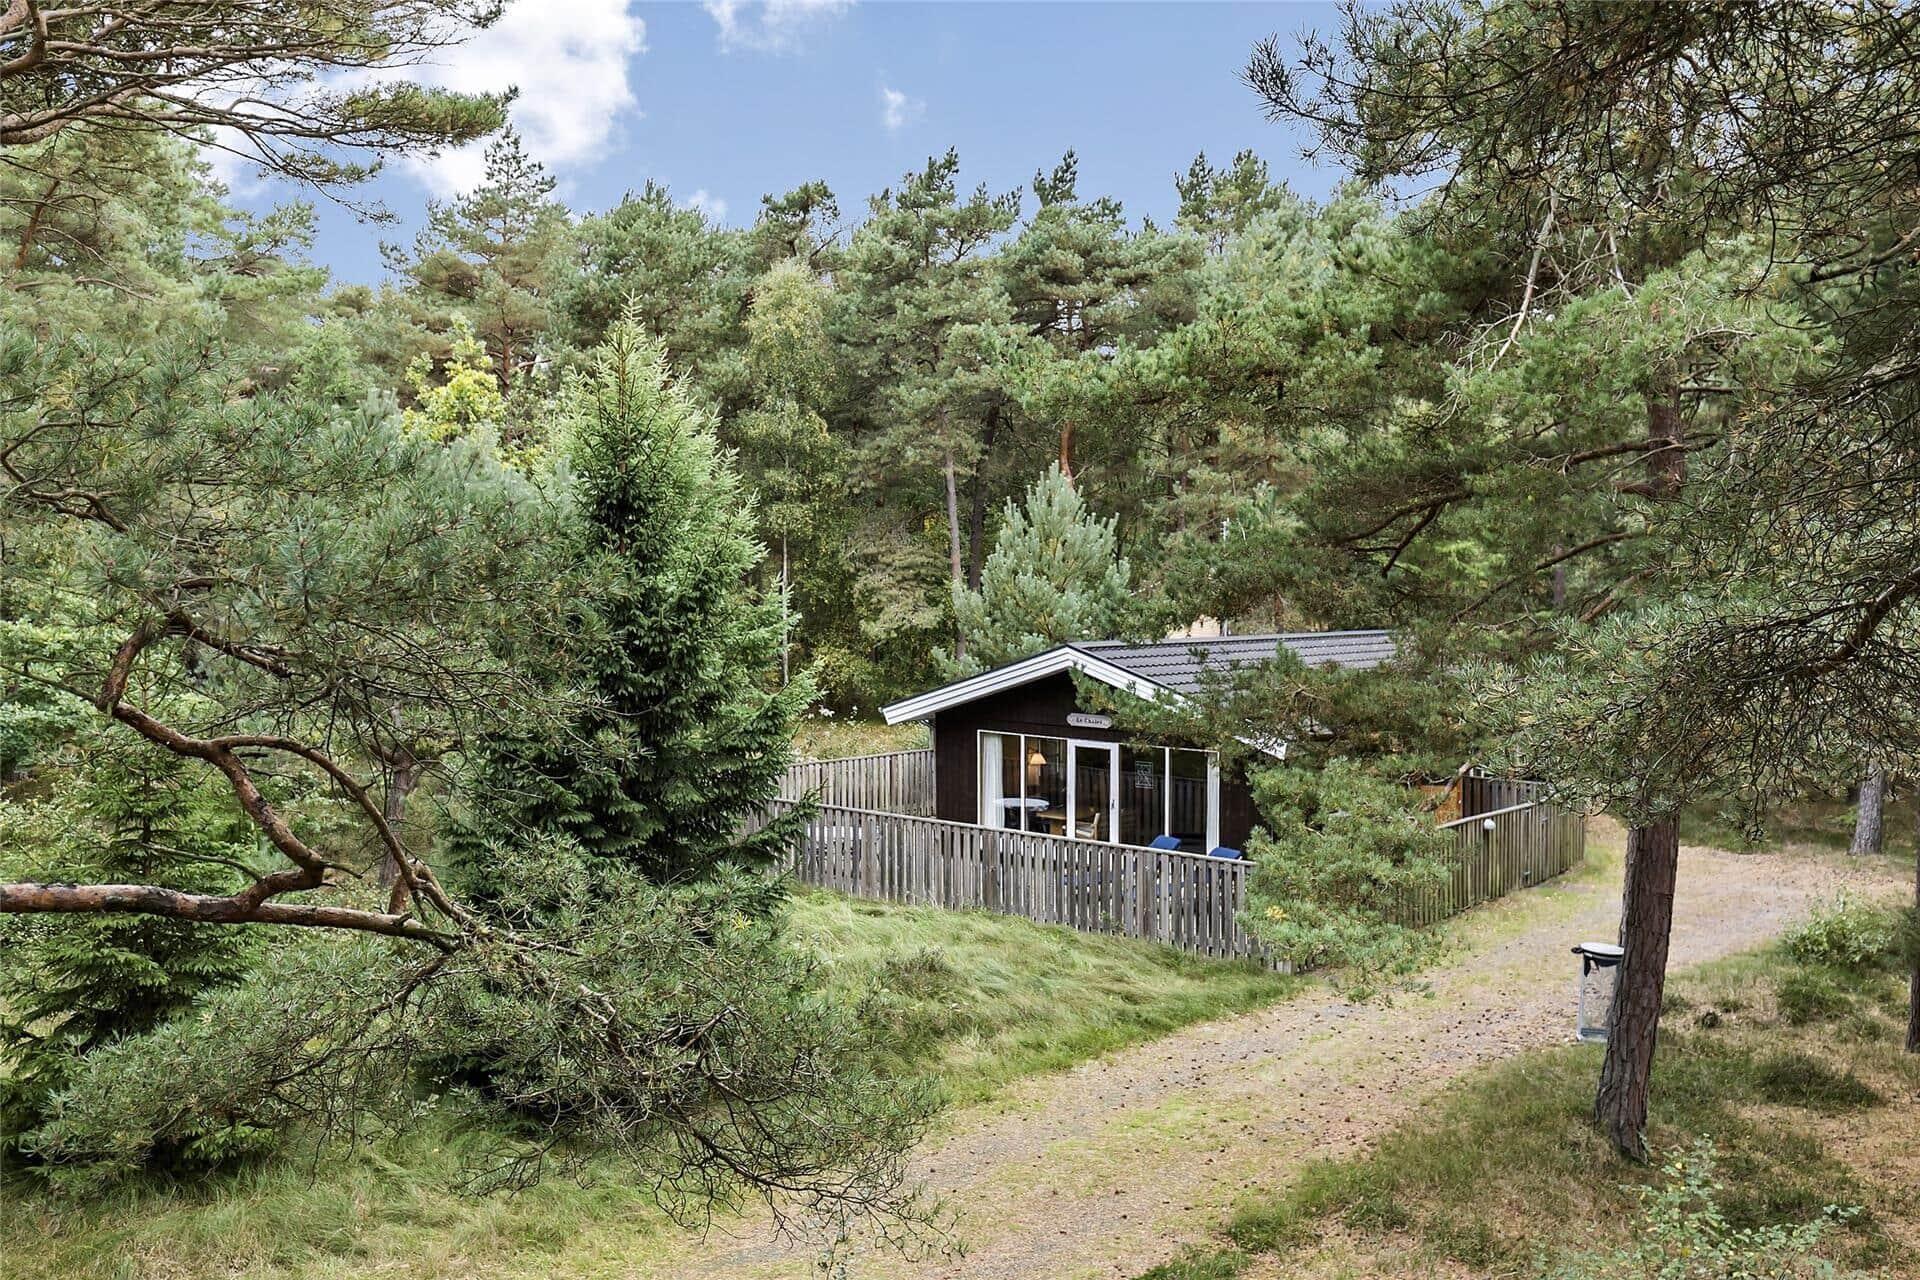 Bild 1-10 Ferienhaus 2620, Kolonivejen 9, DK - 3730 Nexø